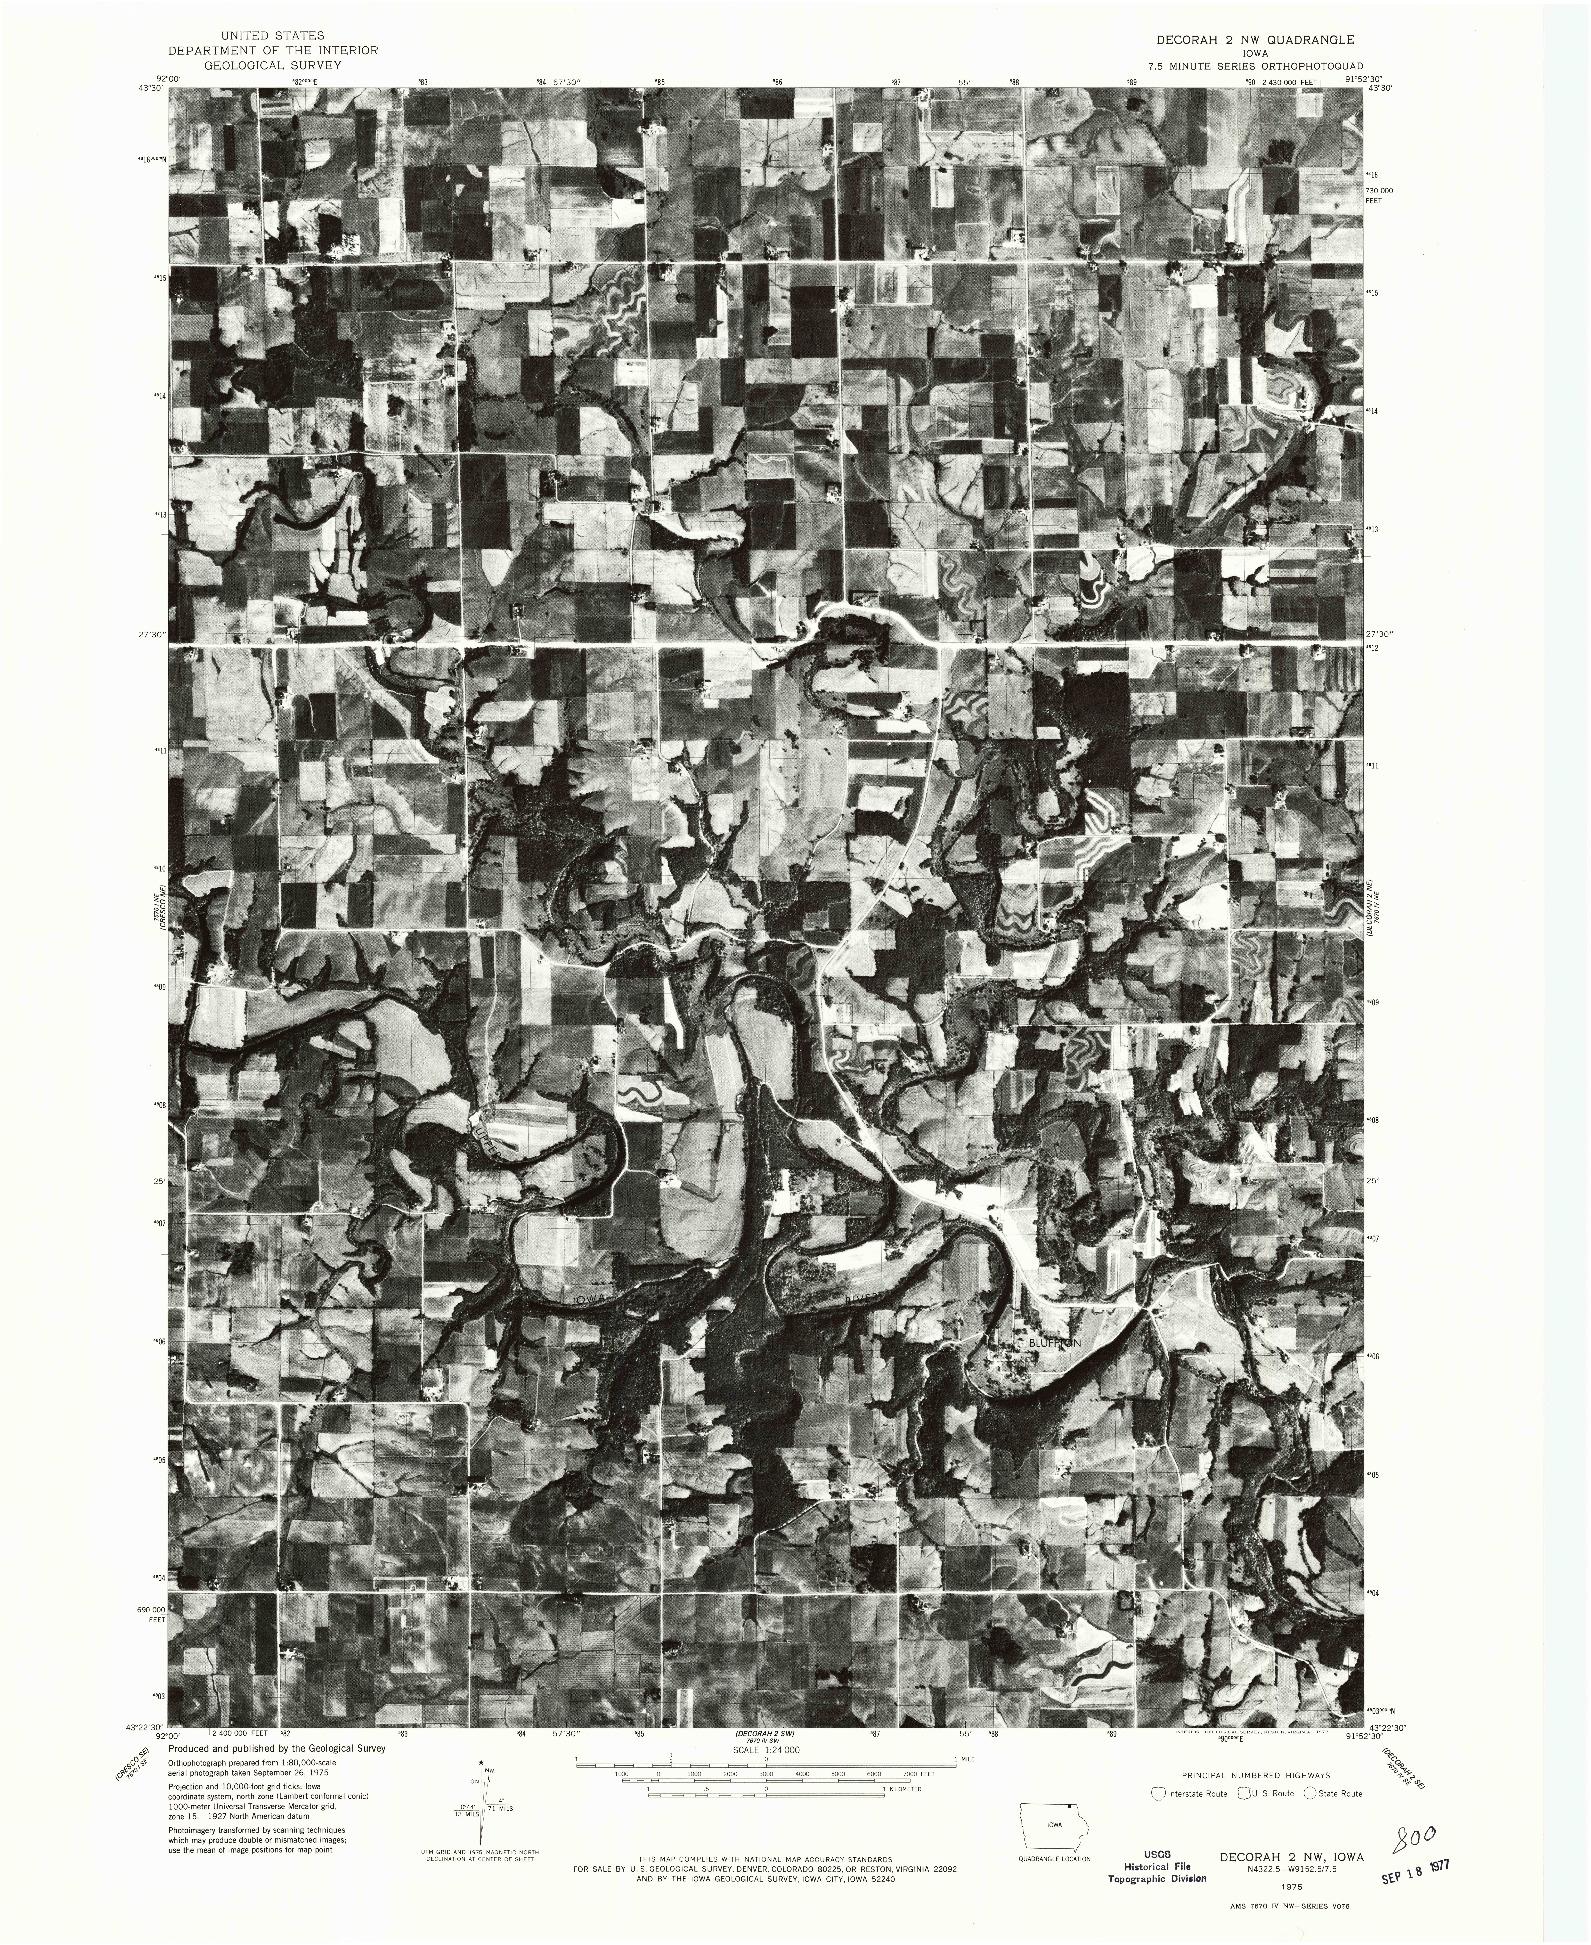 USGS 1:24000-SCALE QUADRANGLE FOR DECORAH 2 NW, IA 1975